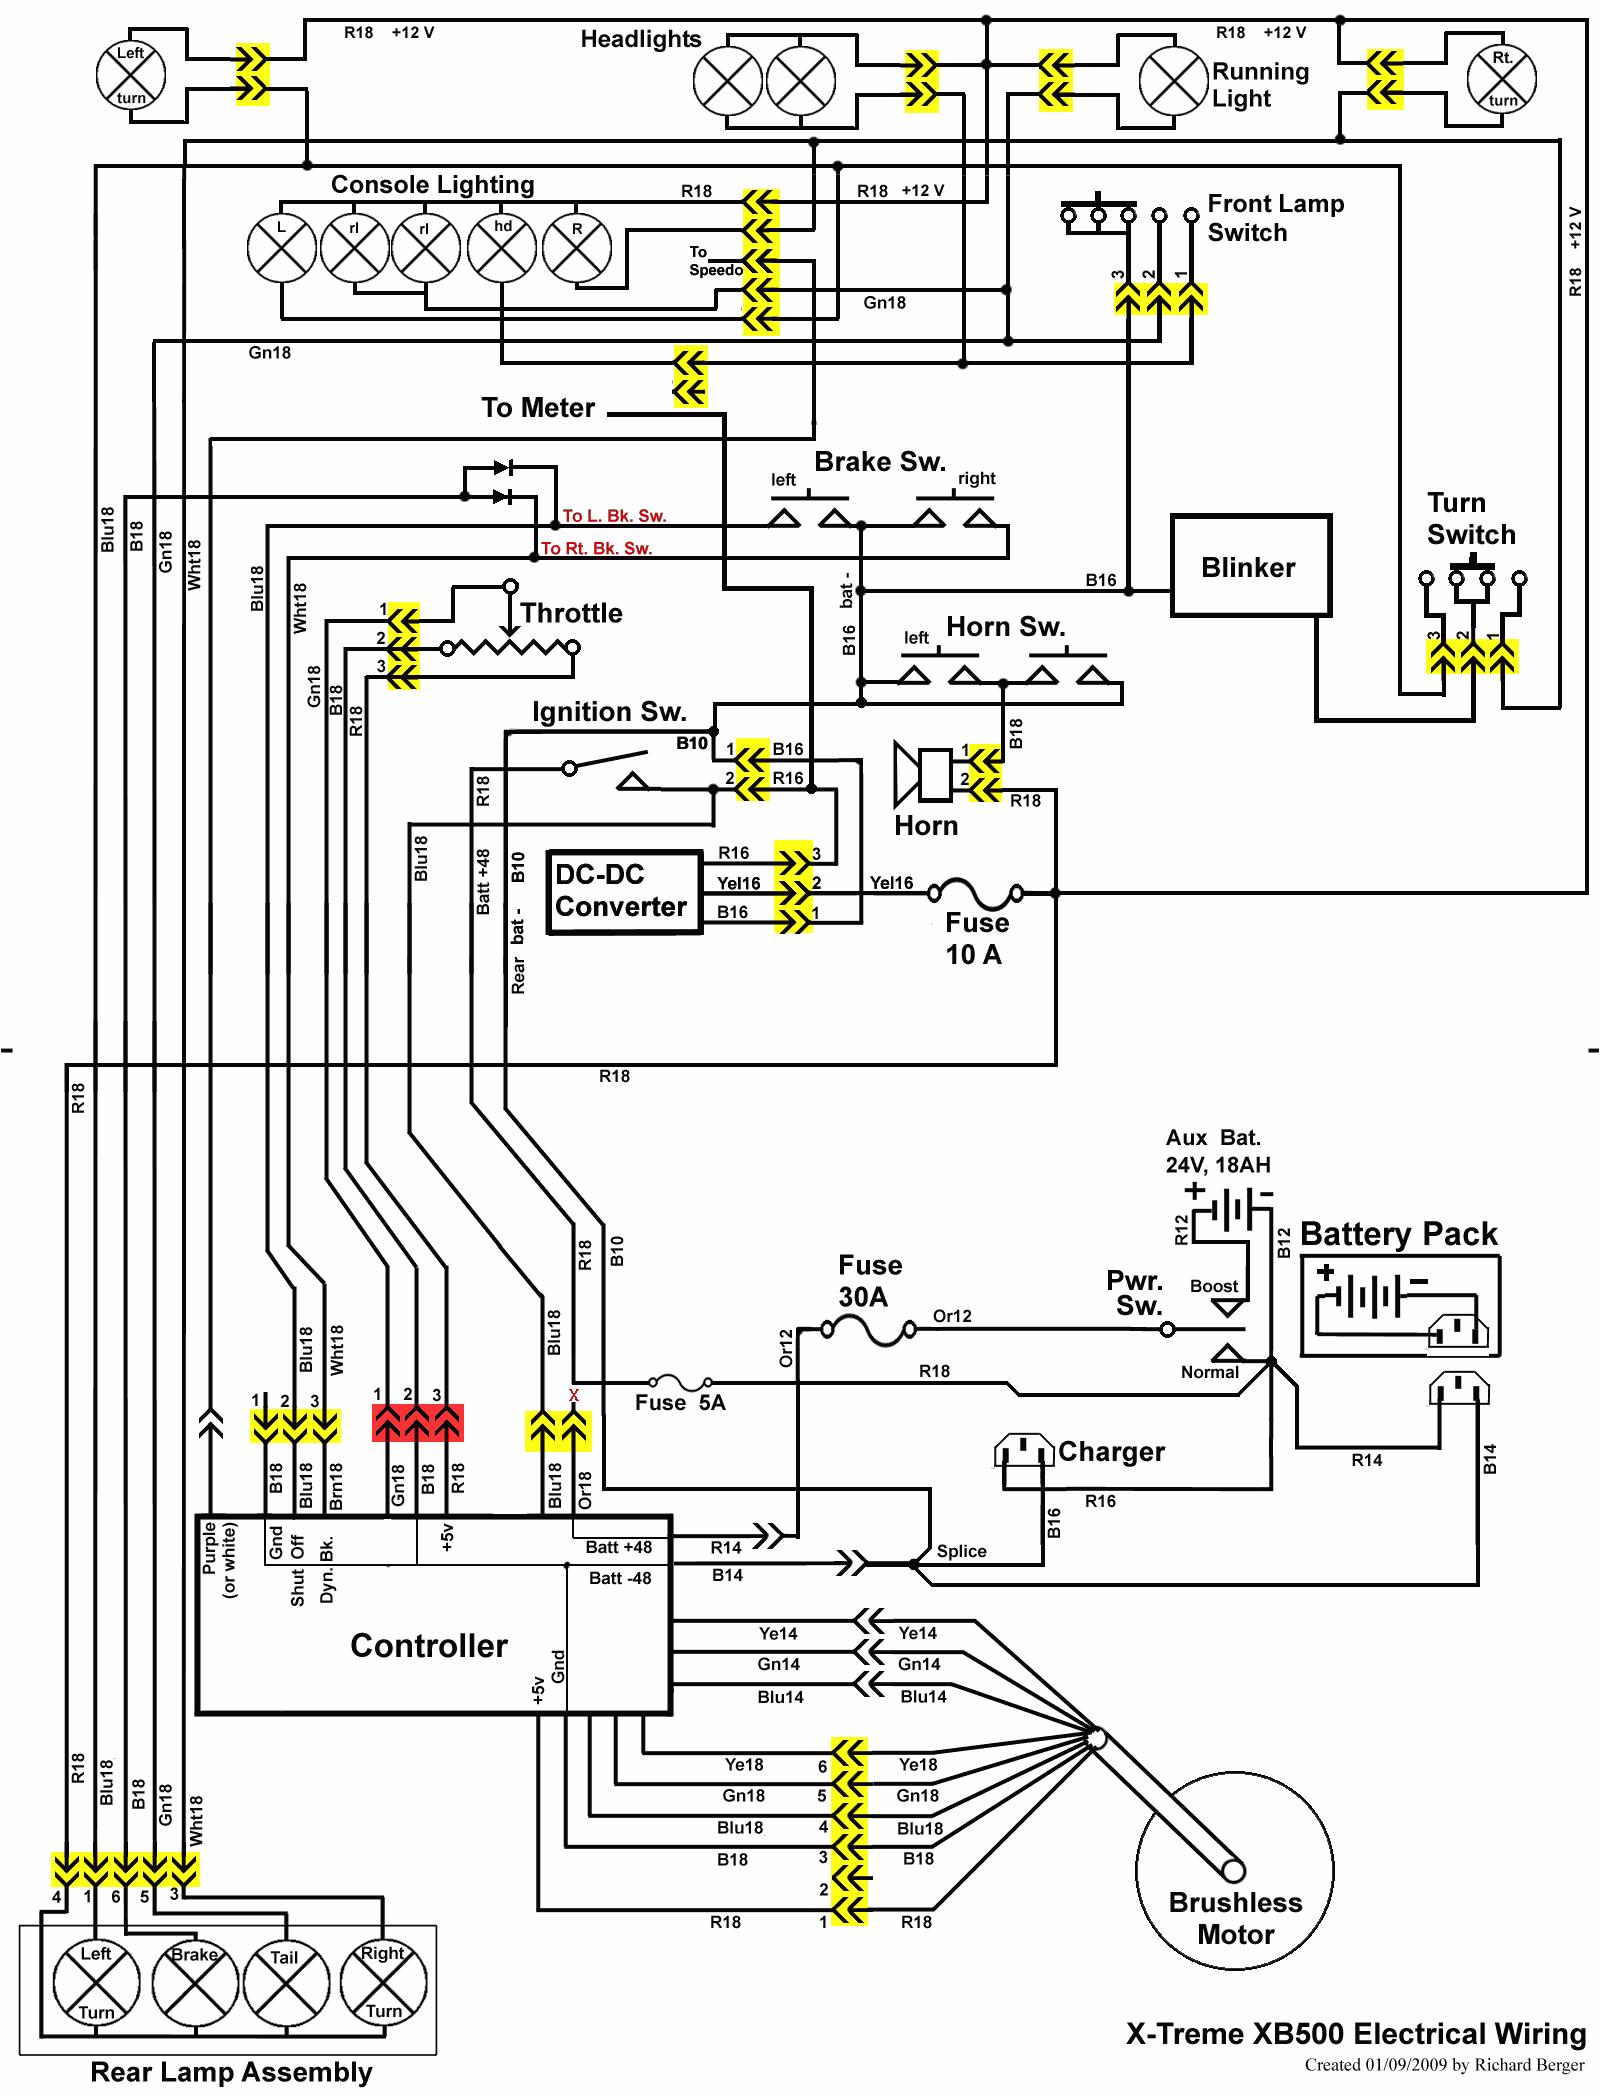 xtreme box wiring diagram wiring diagramxb 600 xtreme wiring diagram wiring diagrams secondxtreme wiring diagram wiring